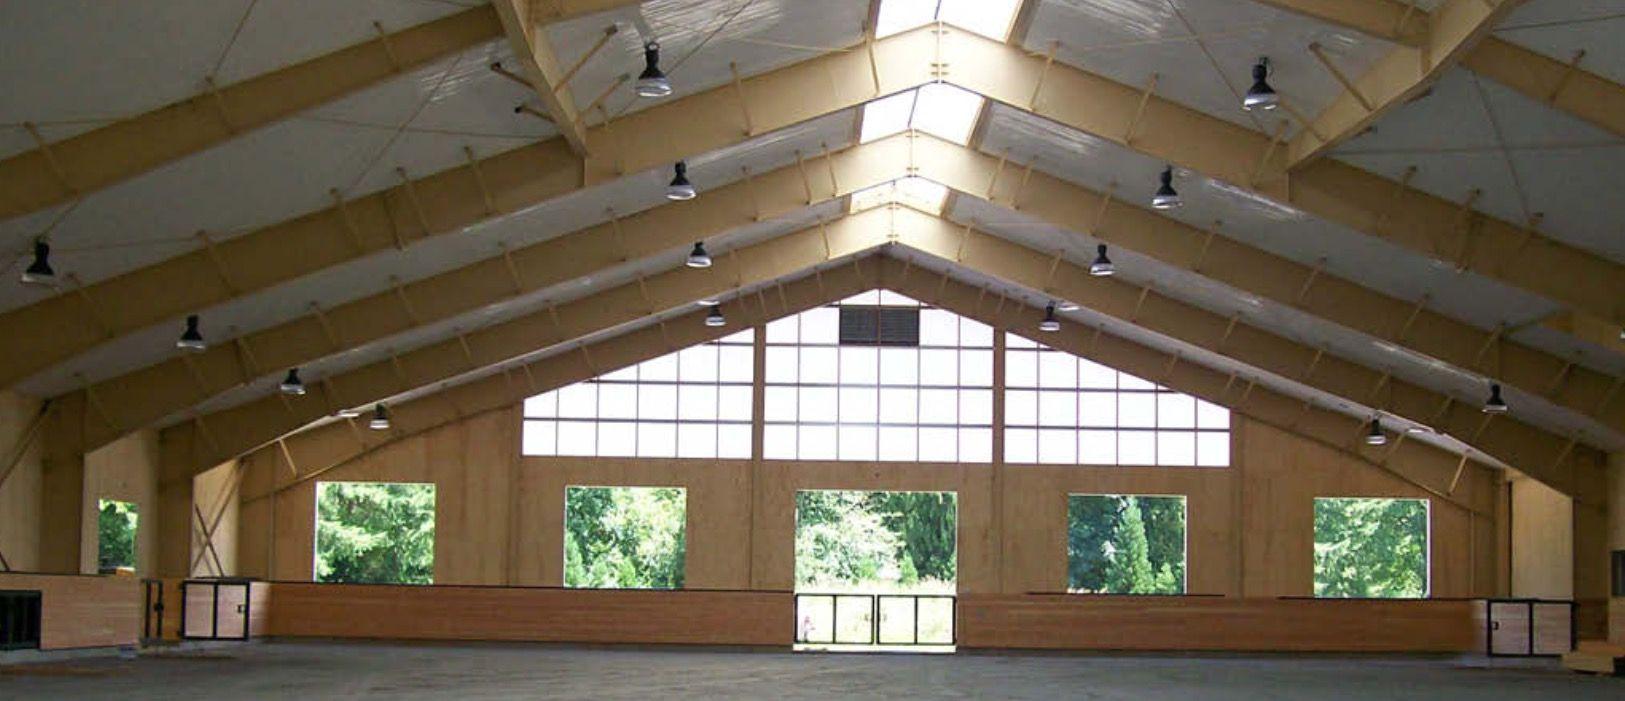 Ridgefield Equestrian Facility Indoor Arena Equestrian Facilities Equine Facility Design Indoor Arena